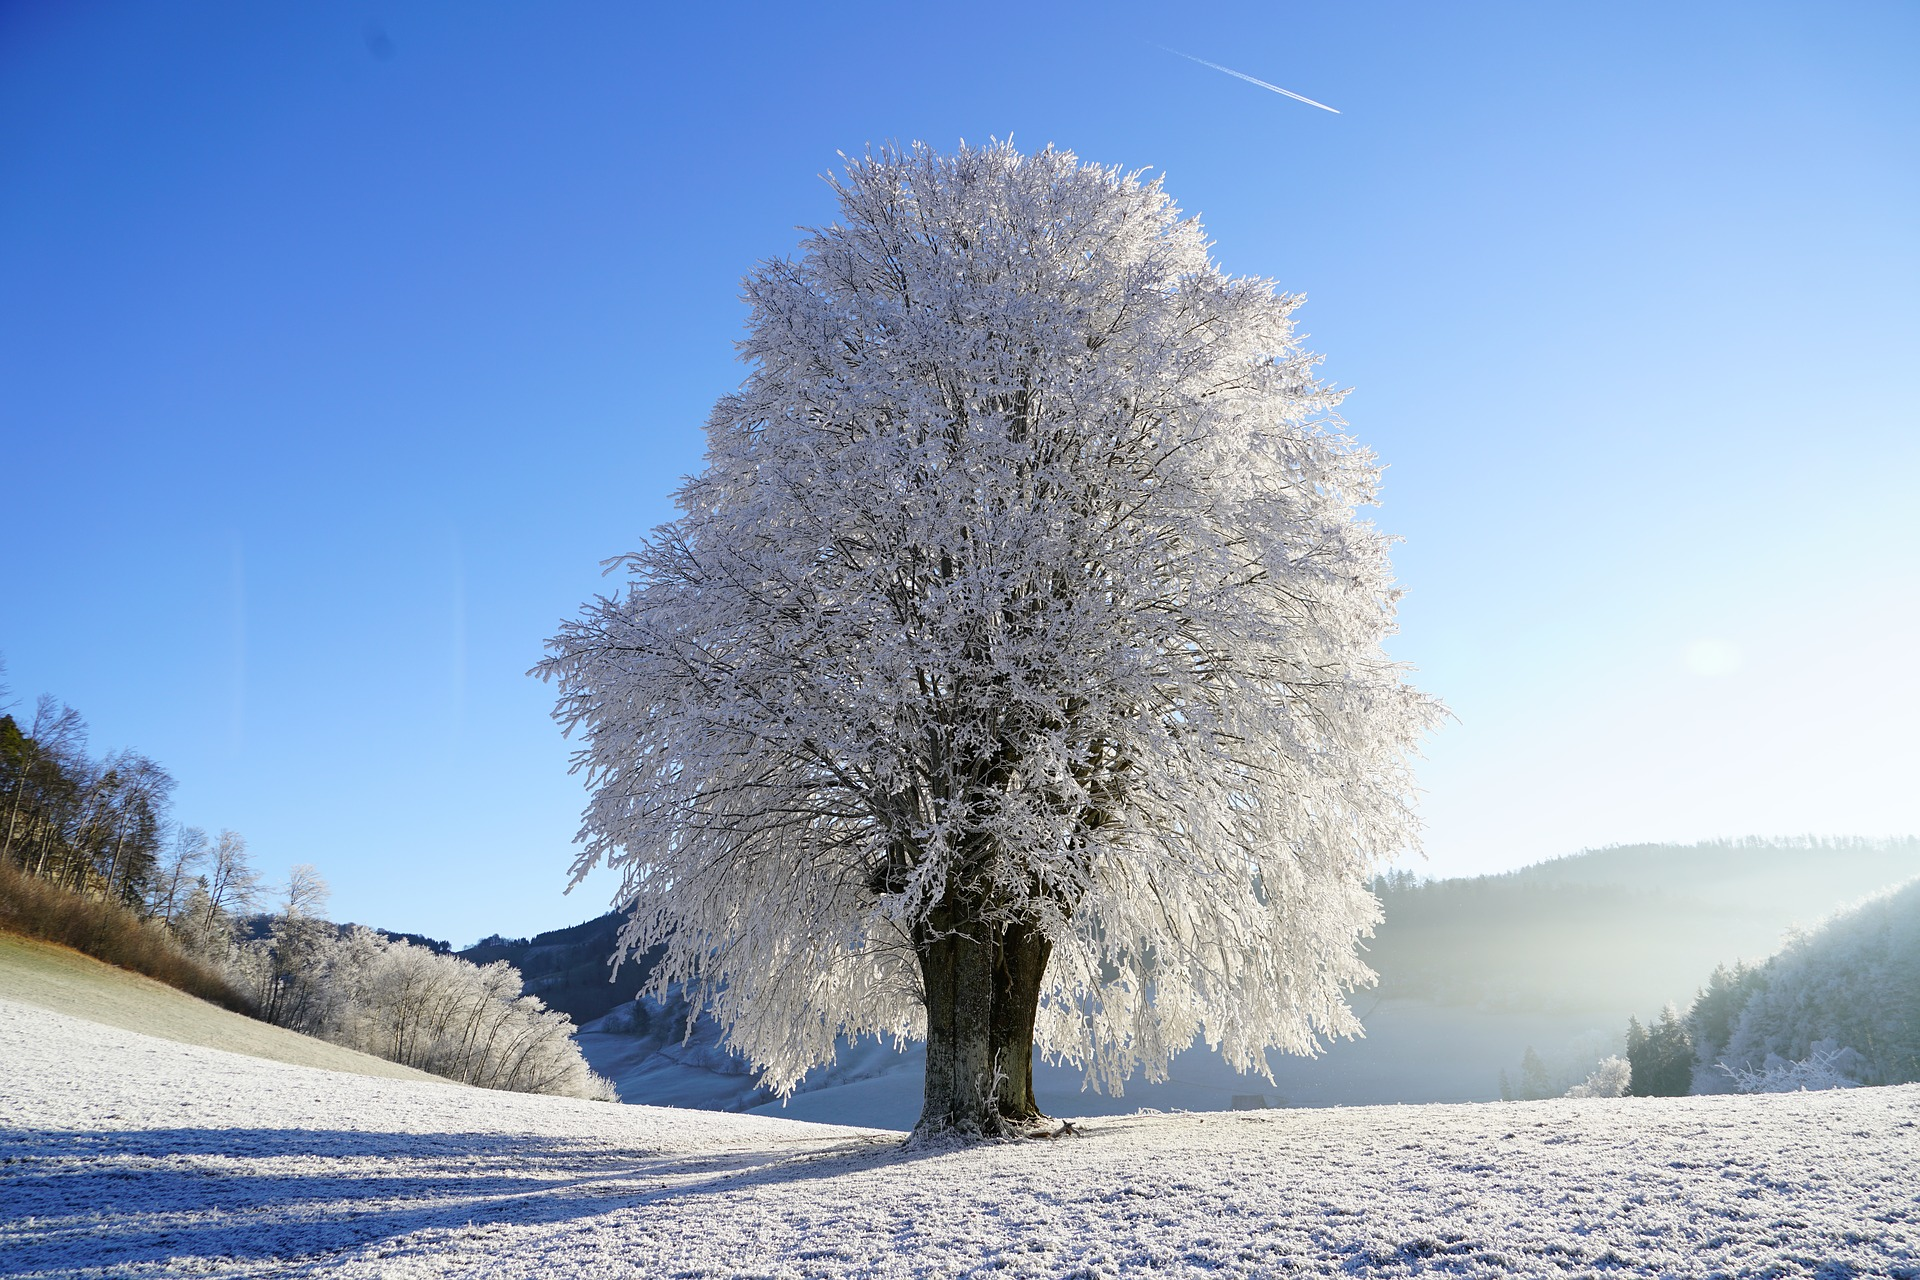 tree-1959267_1920.jpg